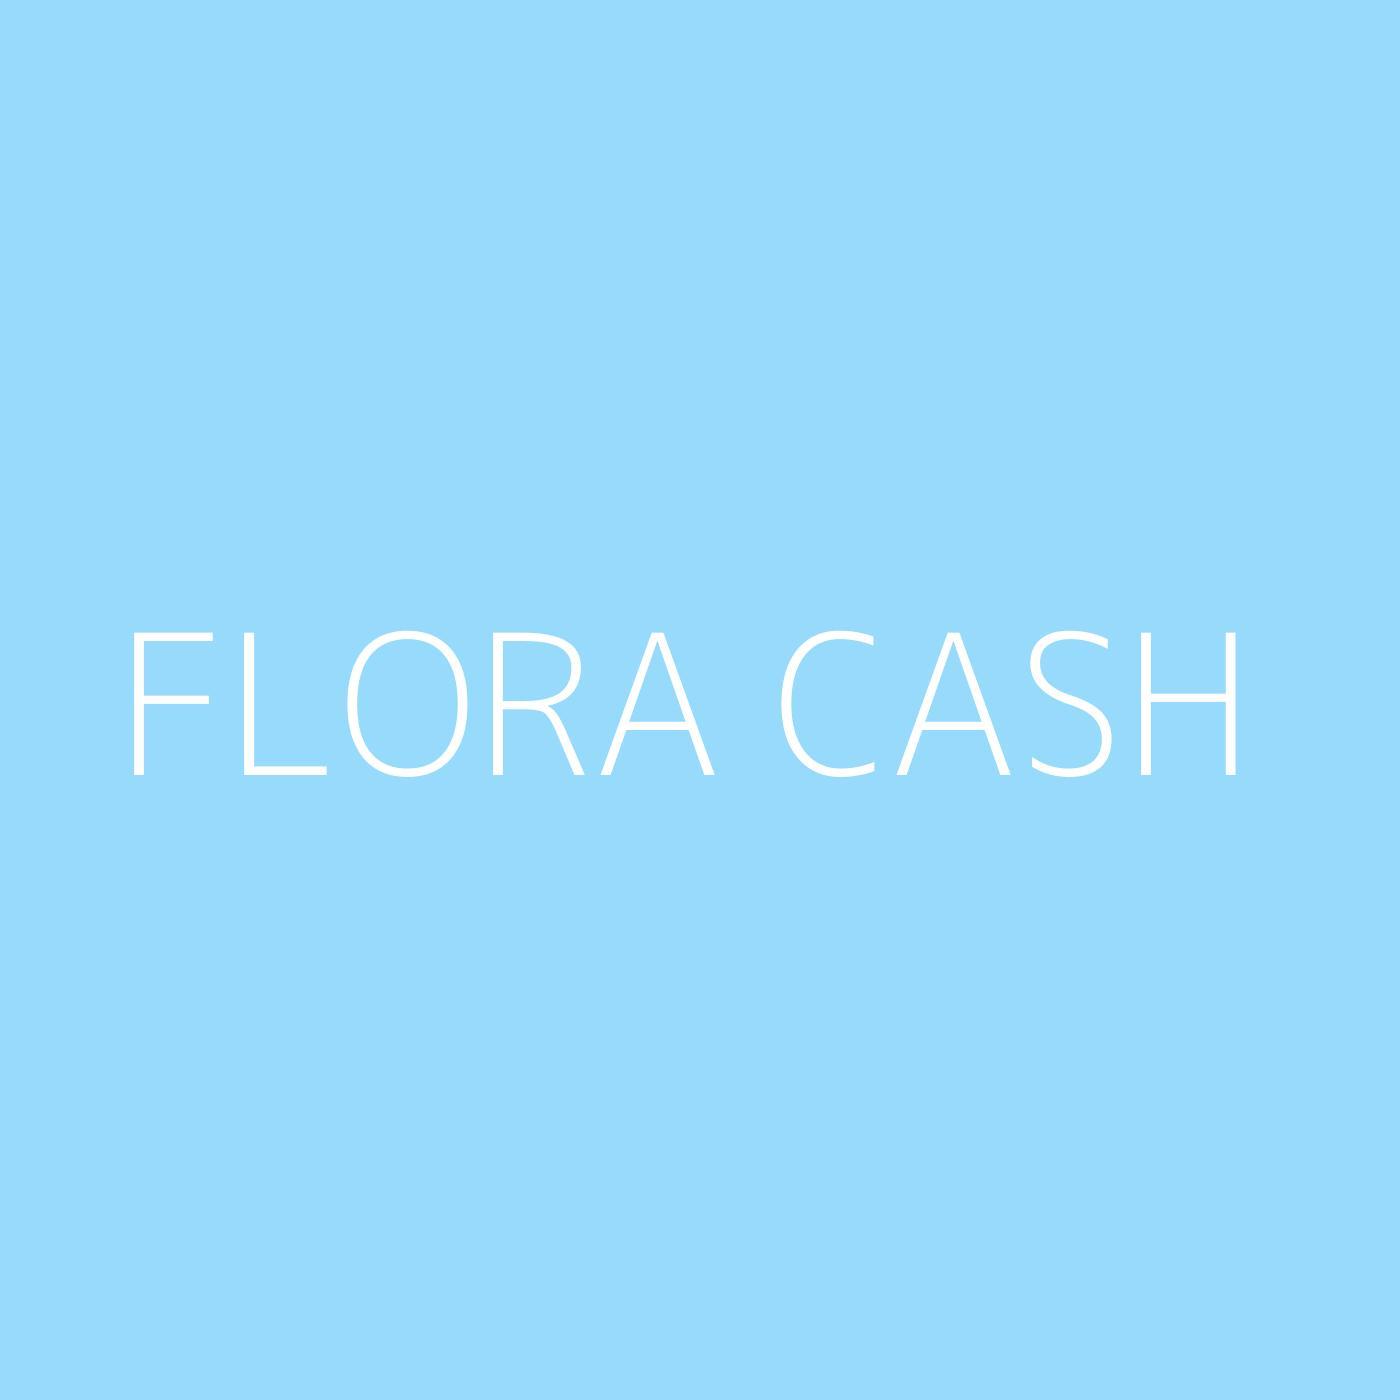 flora cash Playlist Artwork